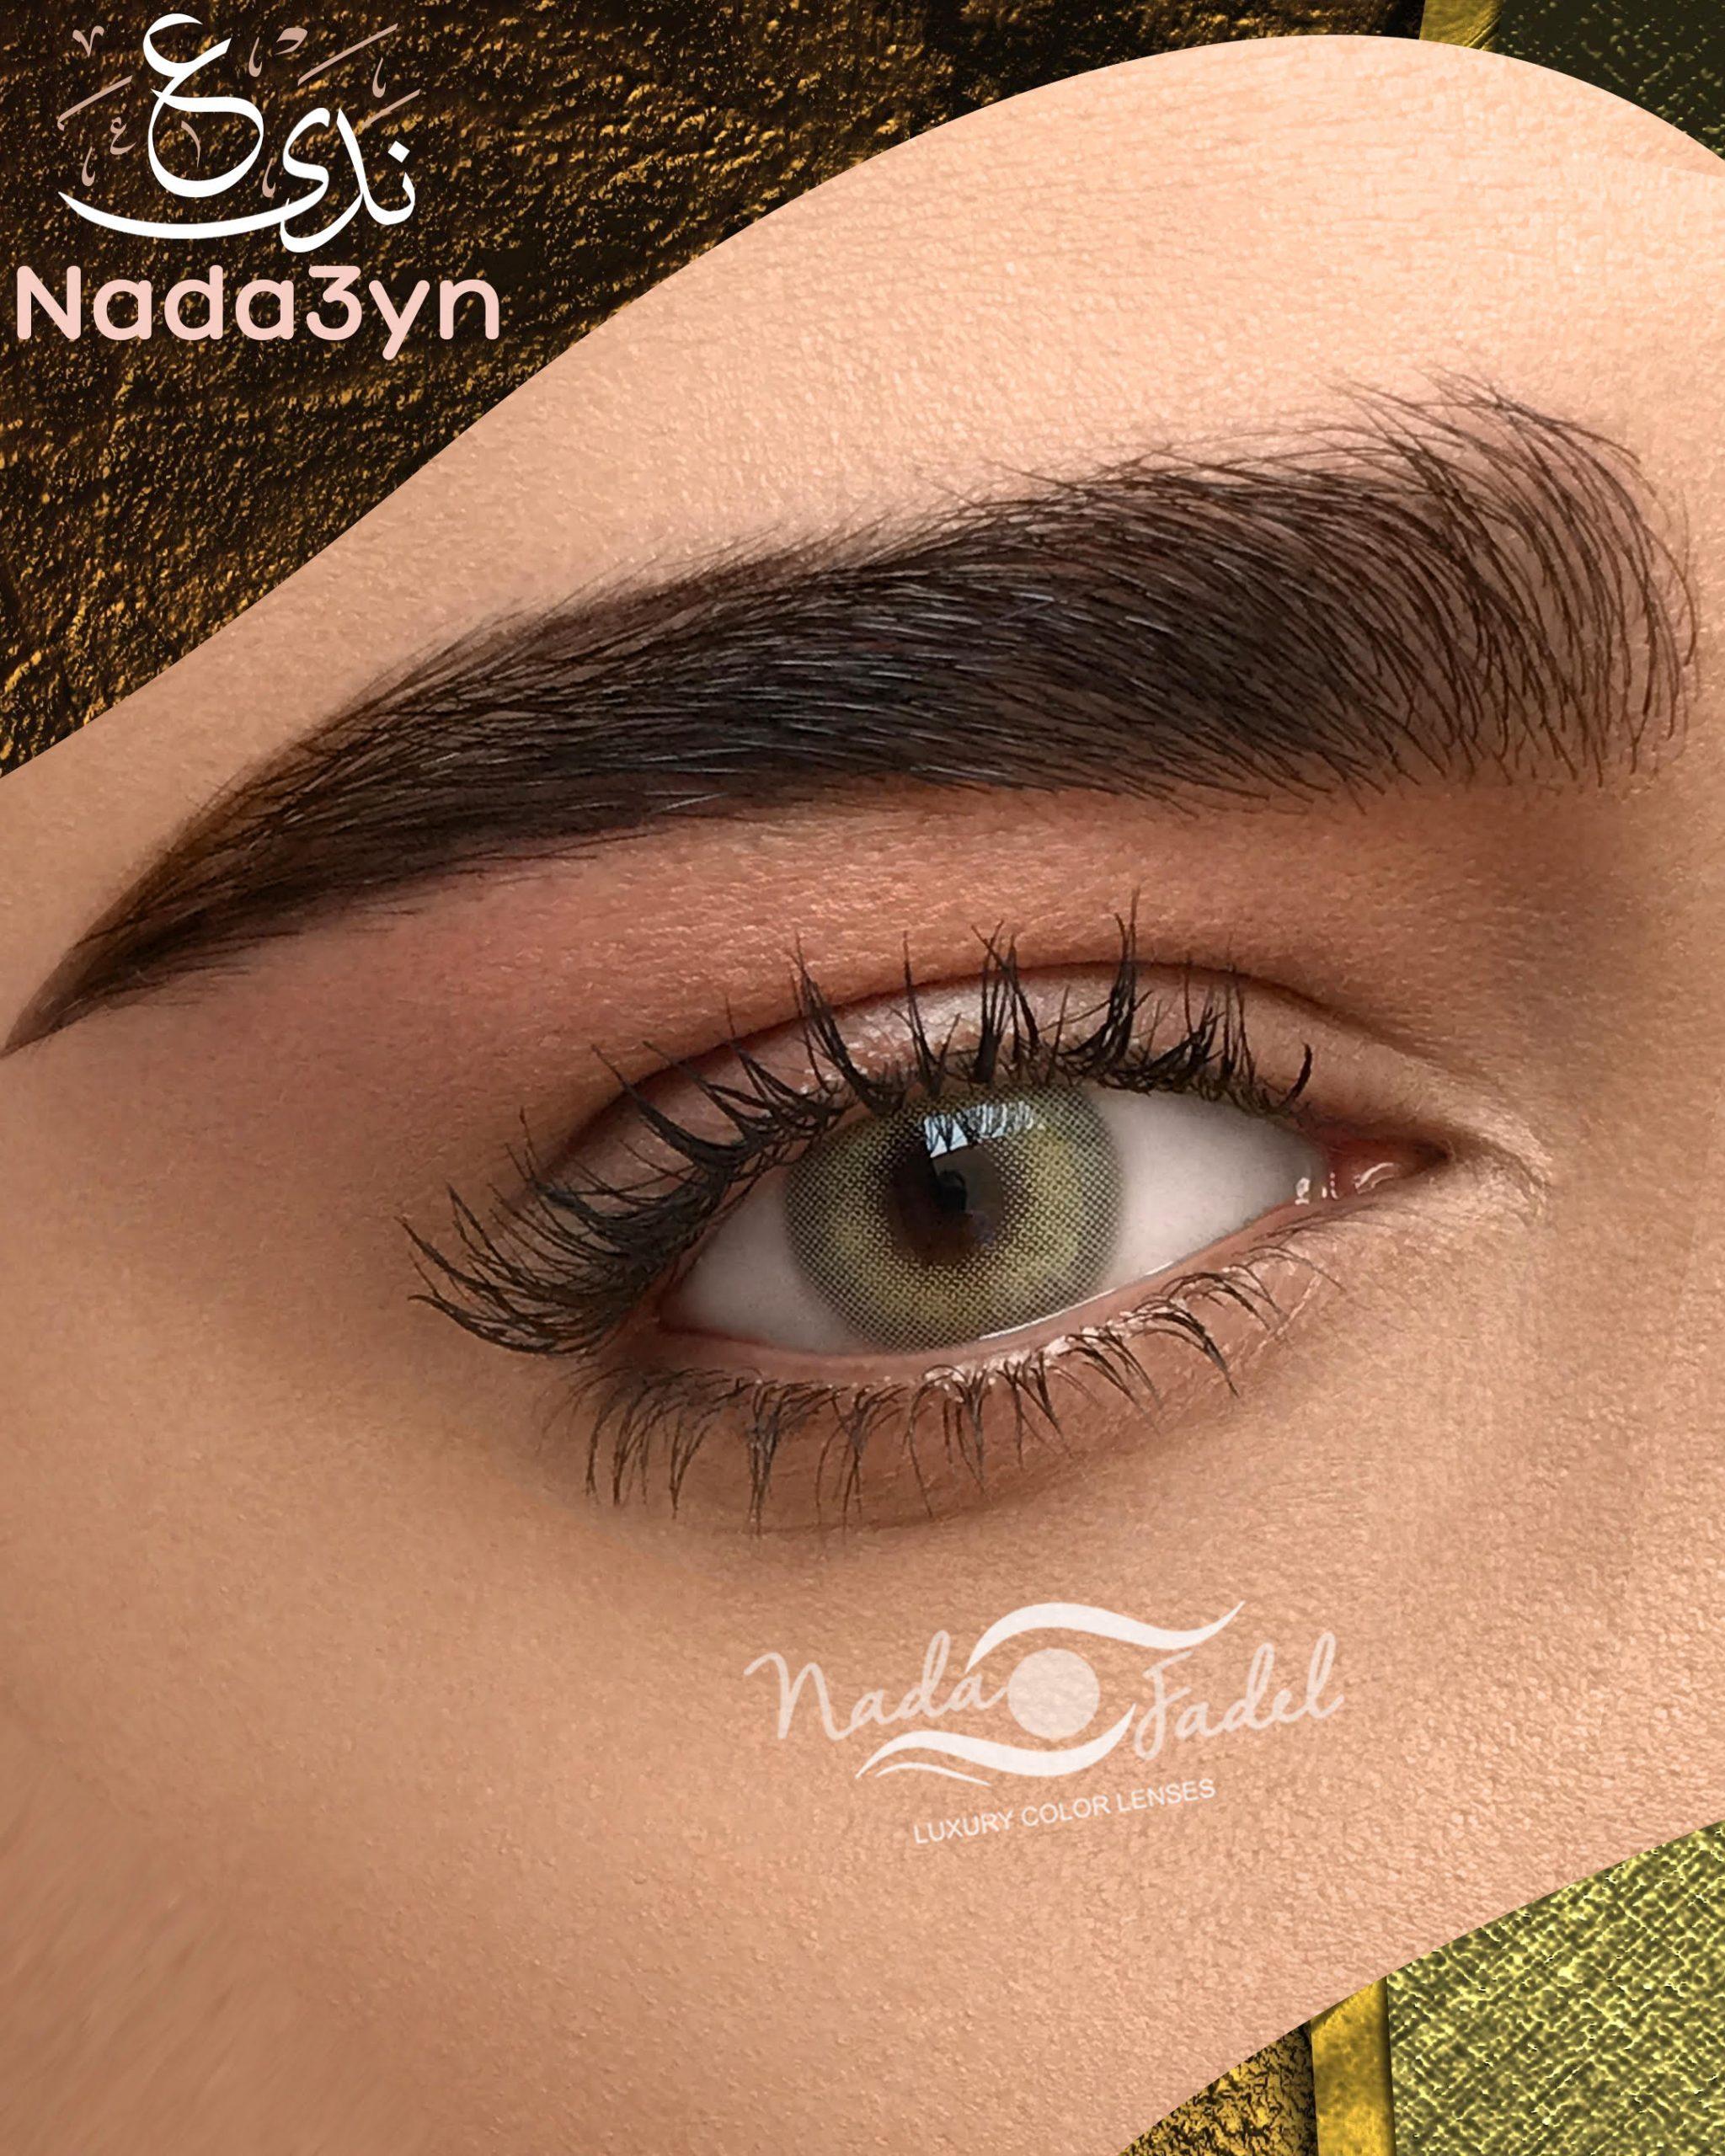 Nada3yn